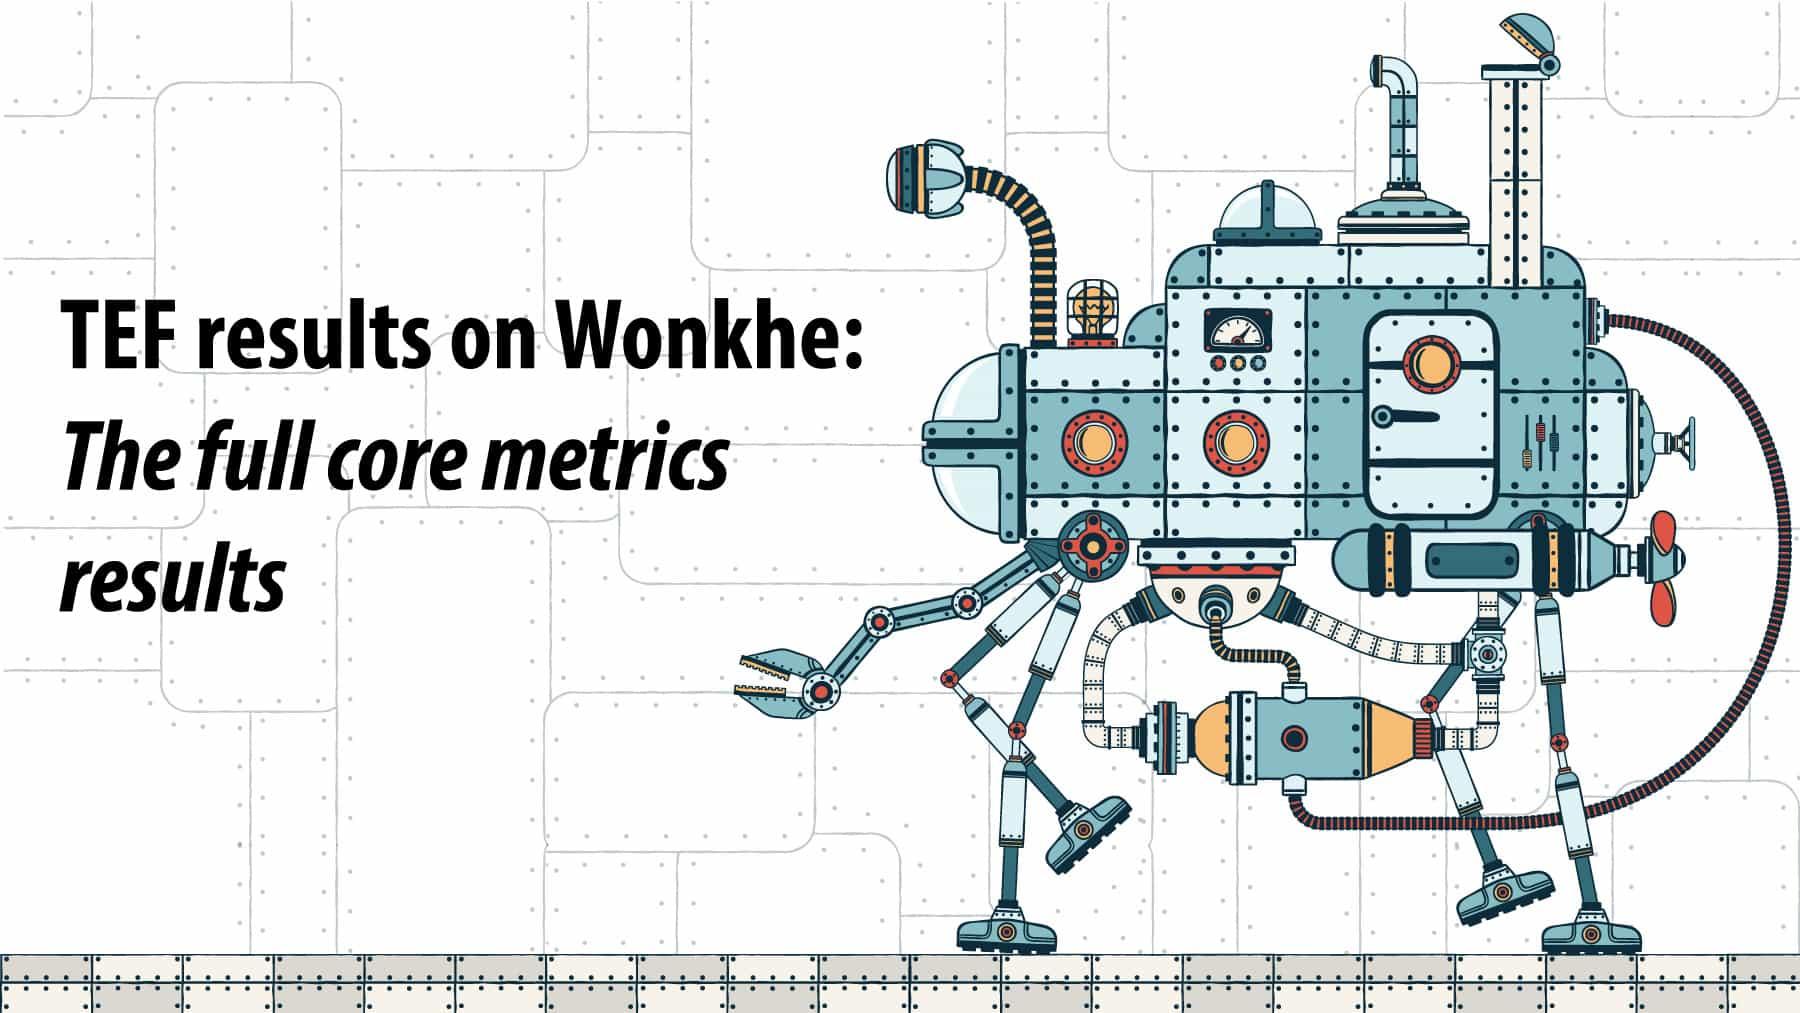 core-metrics-tef-results-ranking